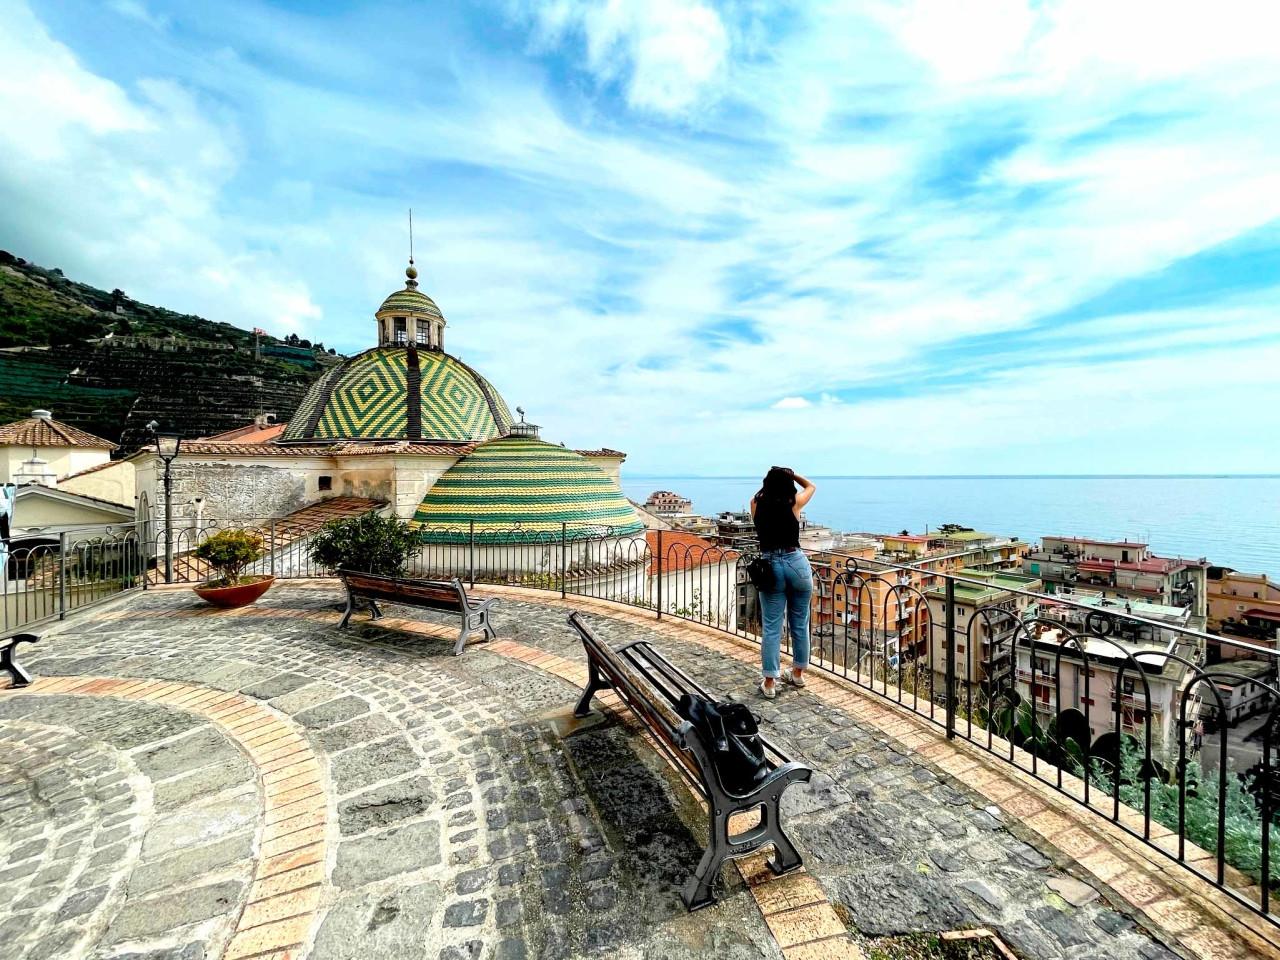 Luoghi iconici da fotografare in Costiera Amalfitana - Travel Amalfi Coast